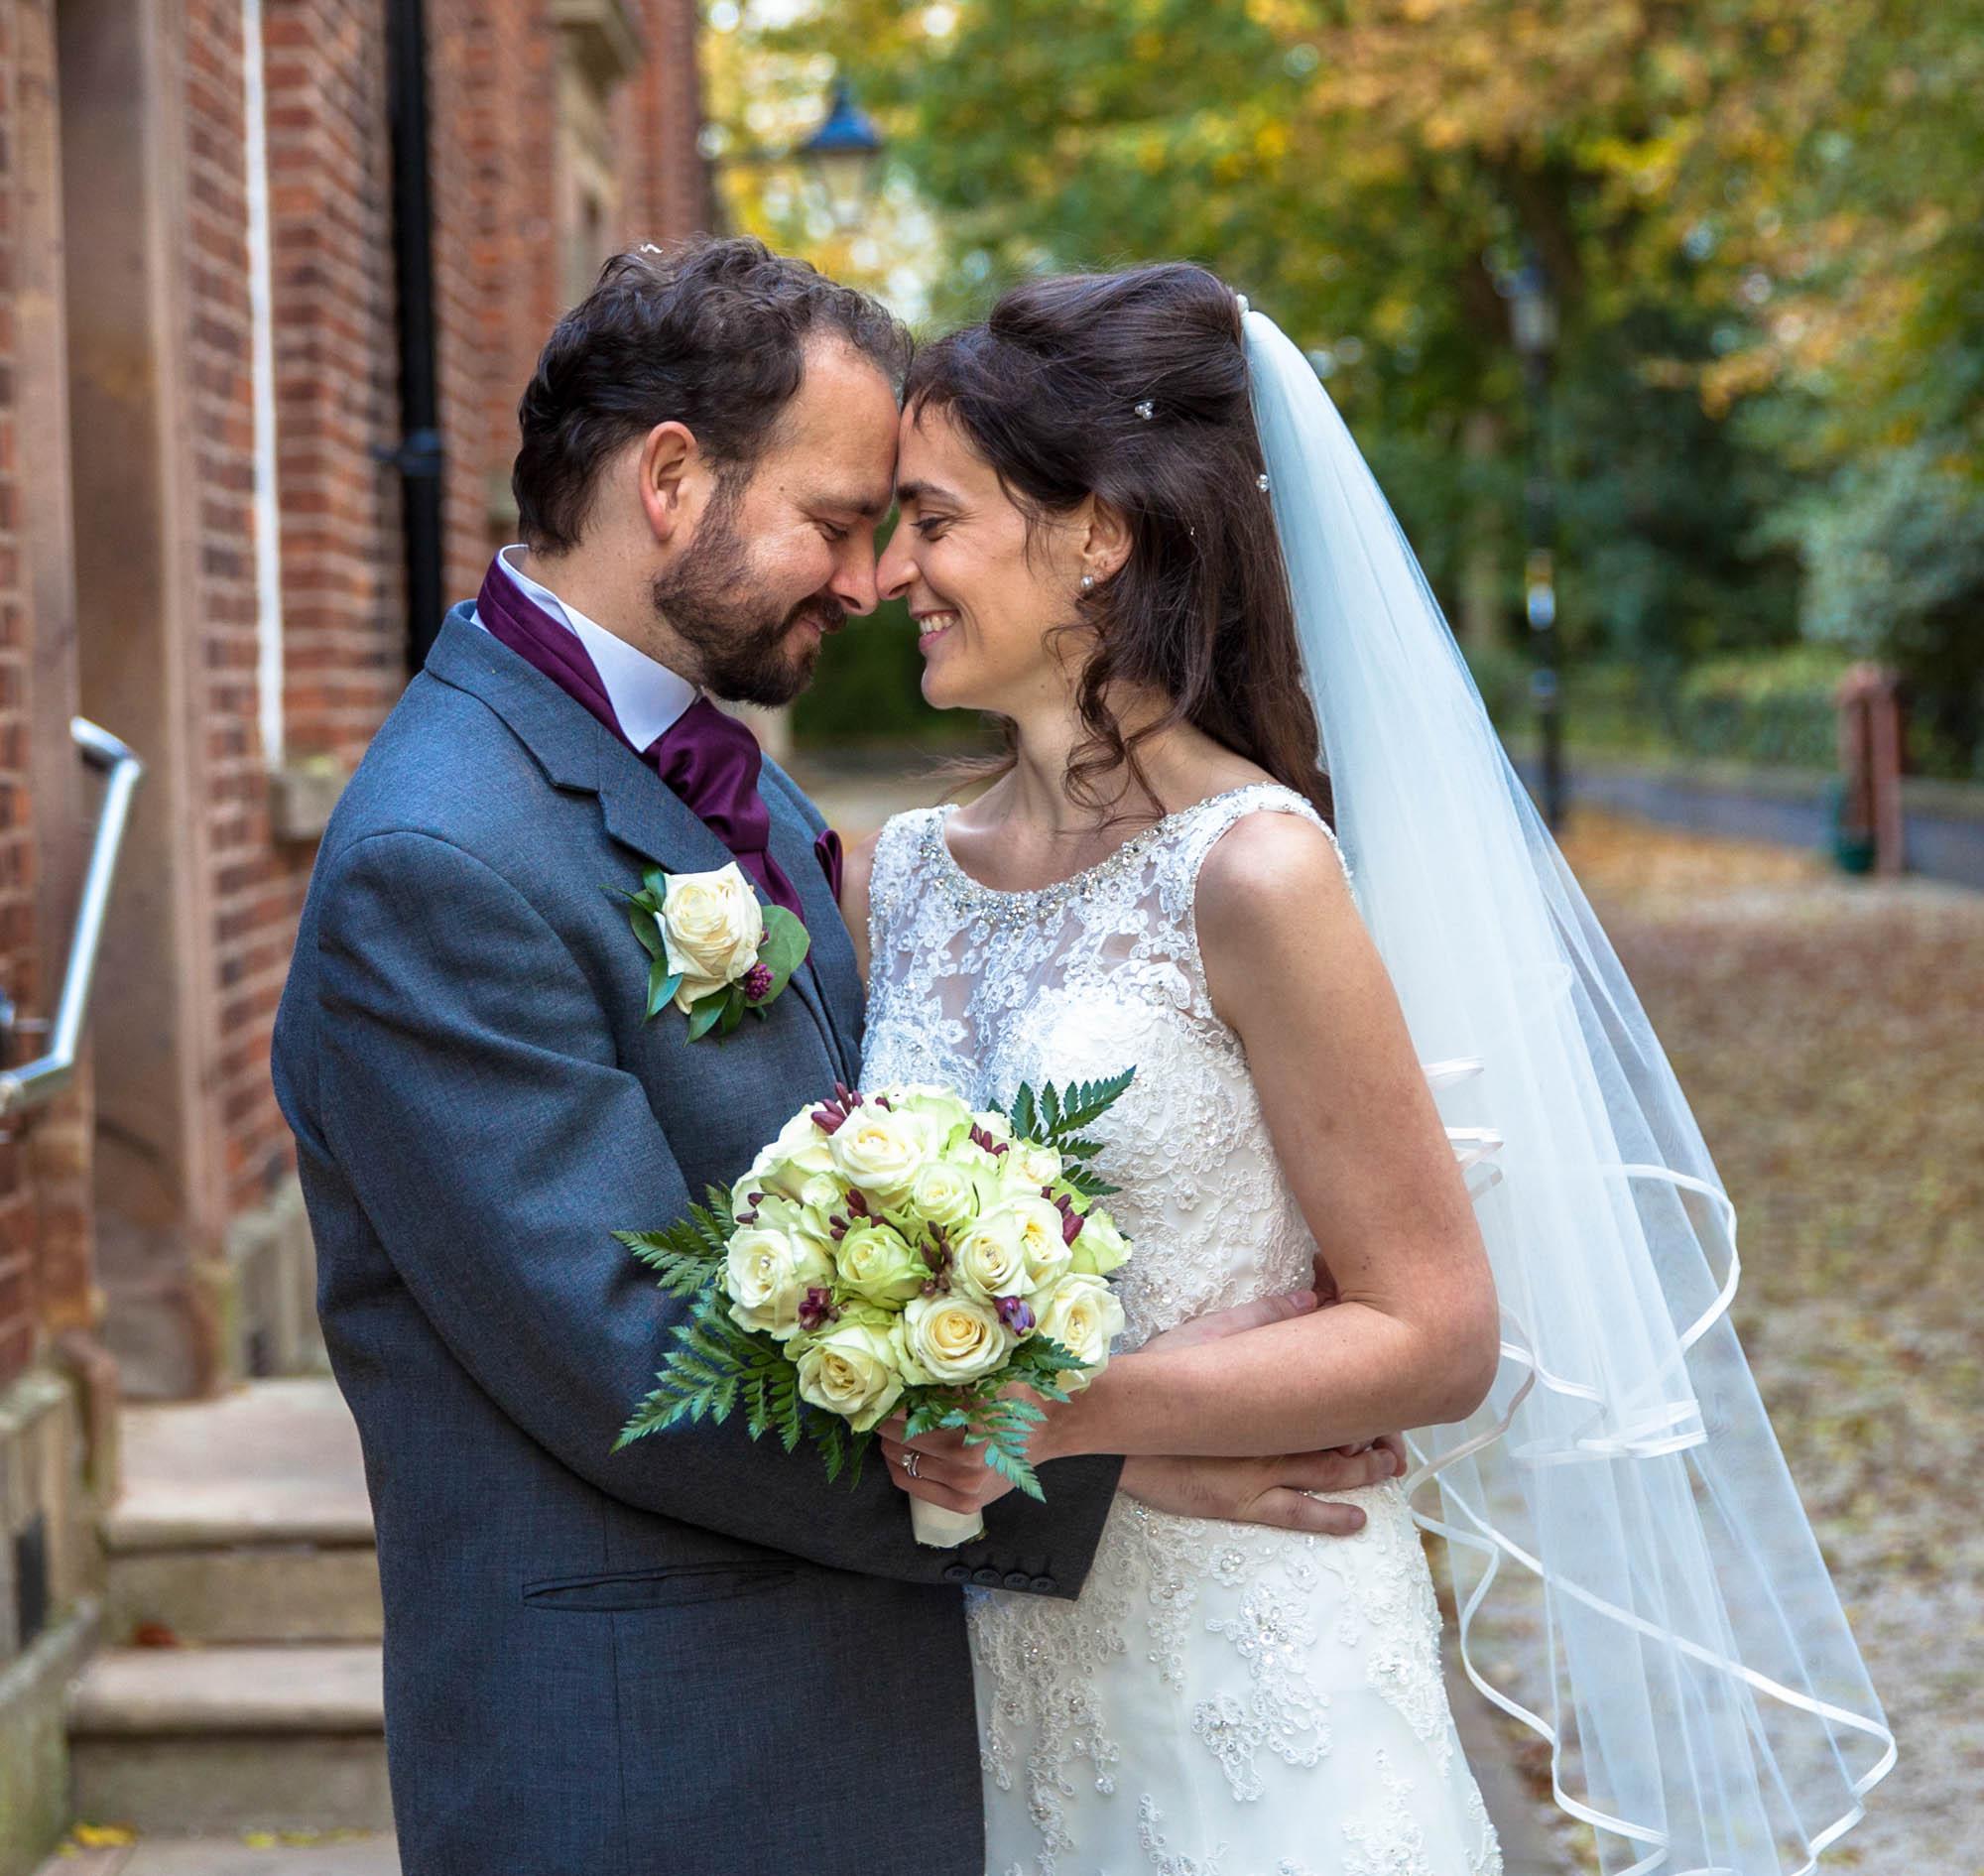 weddings-couples-love-photographer-oxford-london-jonathan-self-photography-80.jpg